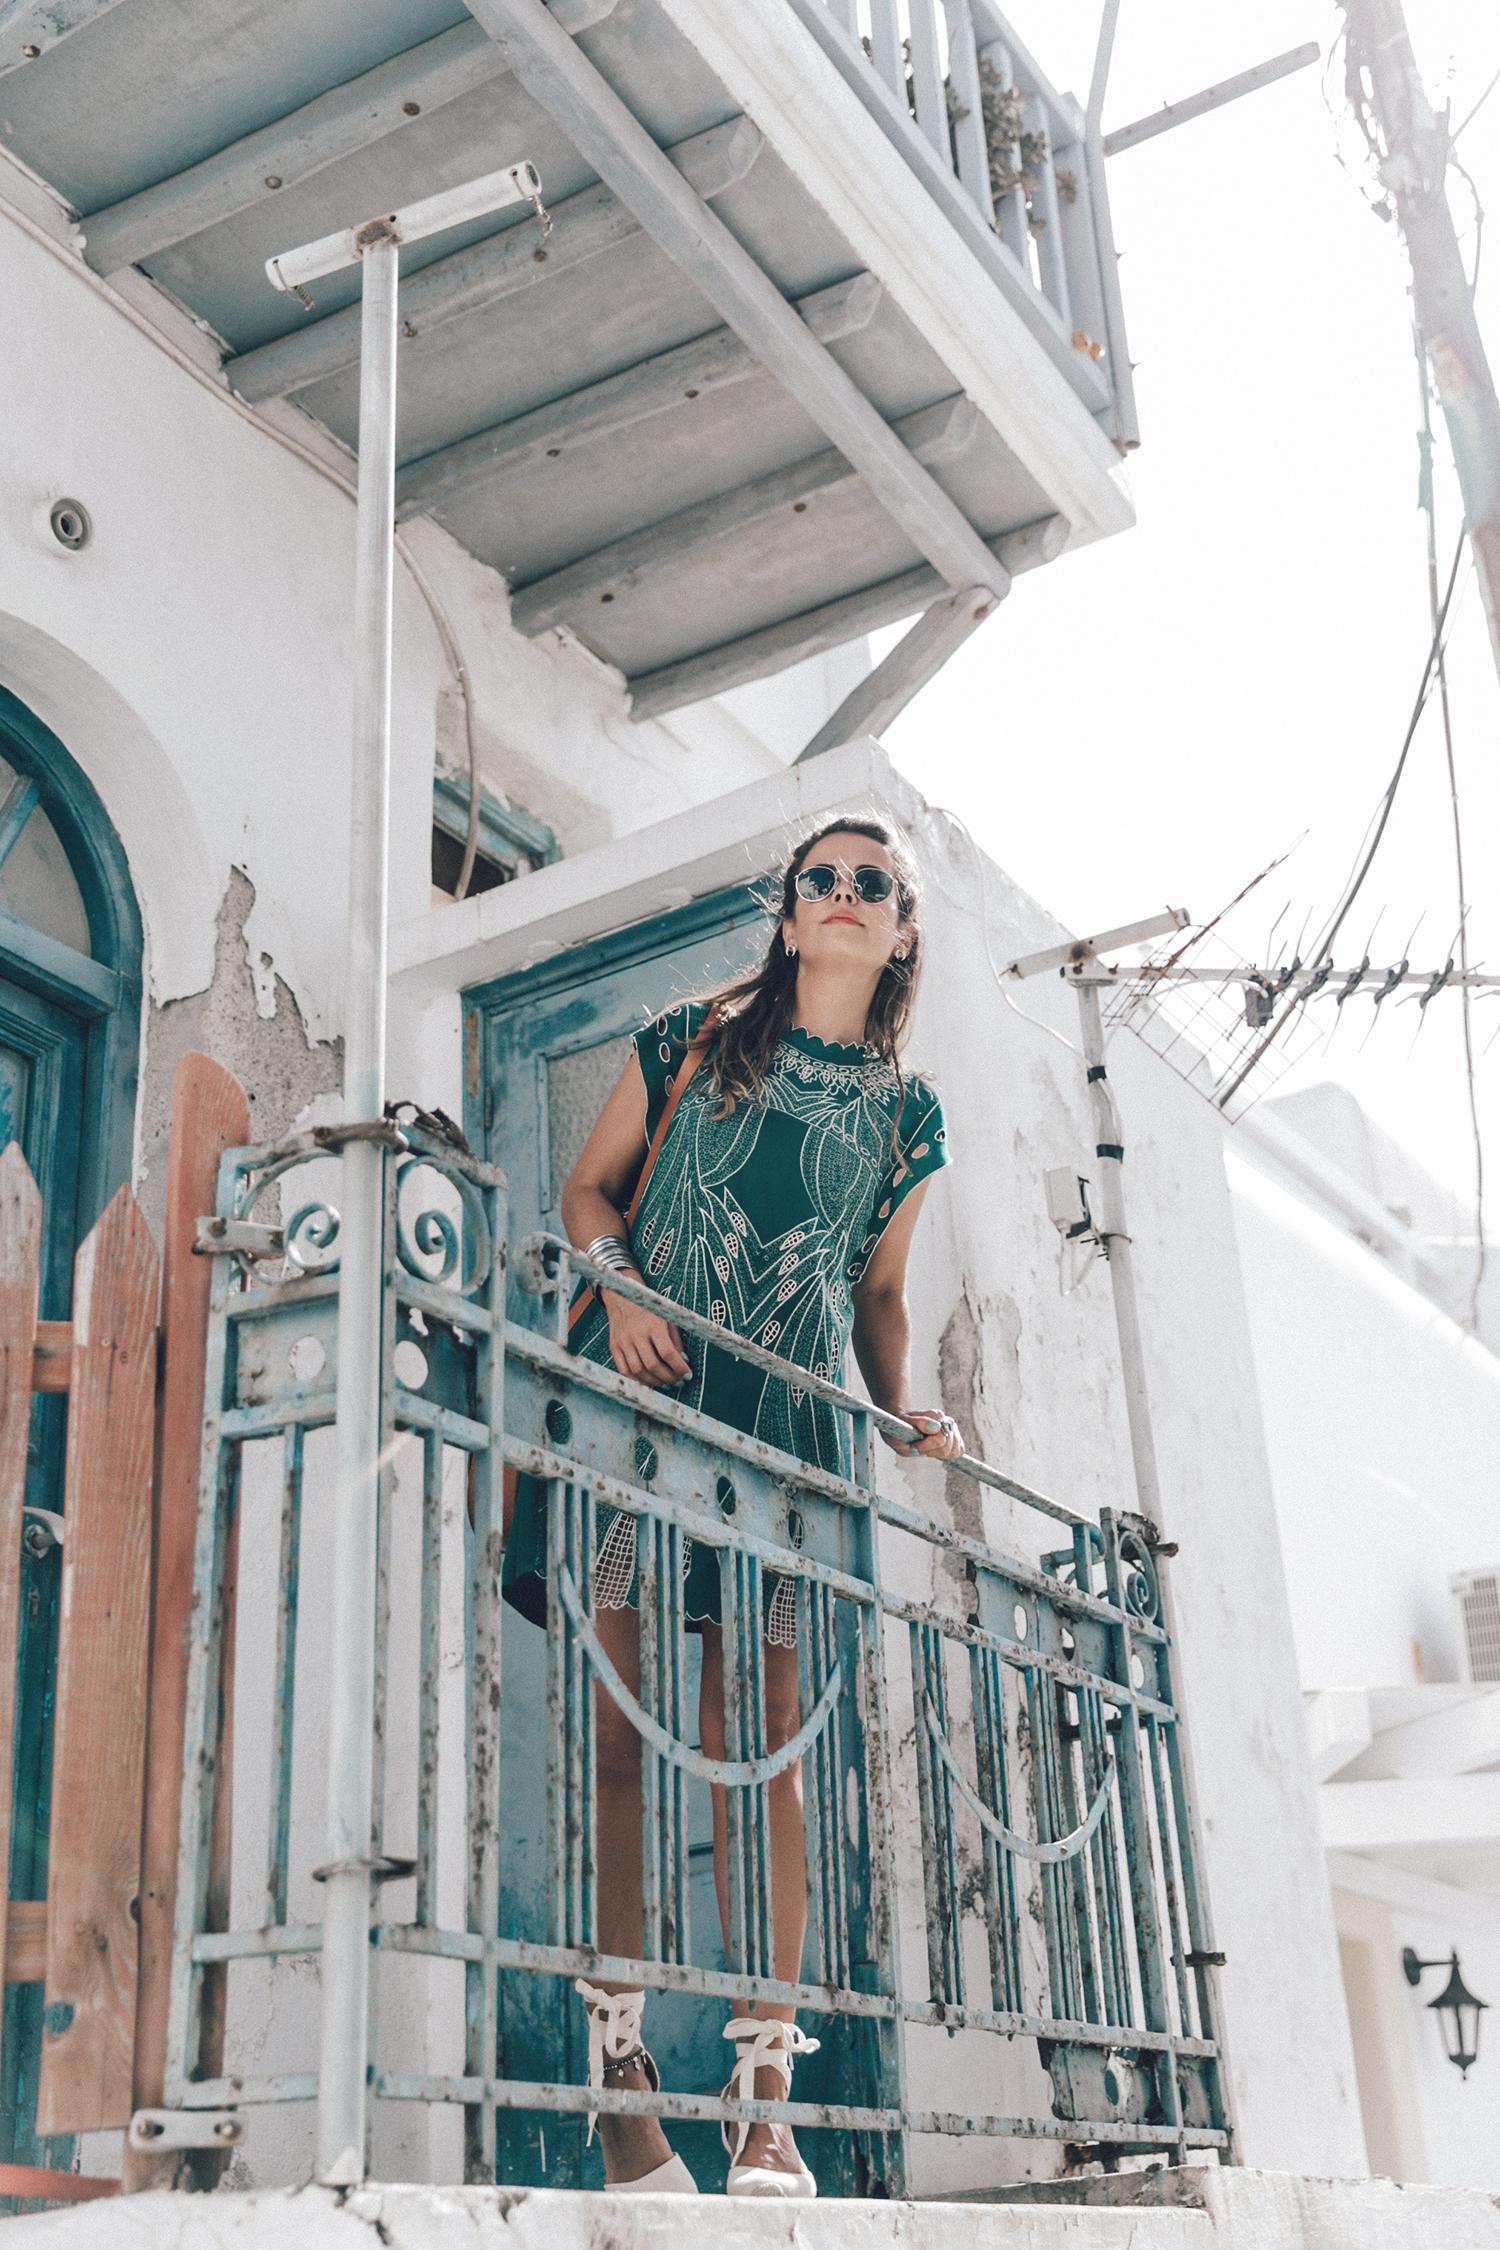 Tularosa_Dress-Soludos_Escapes-Soludos_Espadrilles-Sezane_Bag-Leather_Crossbody_Bag-Boho_Outfit-Look-Ray_Ban-Street_Style-Mykonos-Greece-Collage_Vintage-27